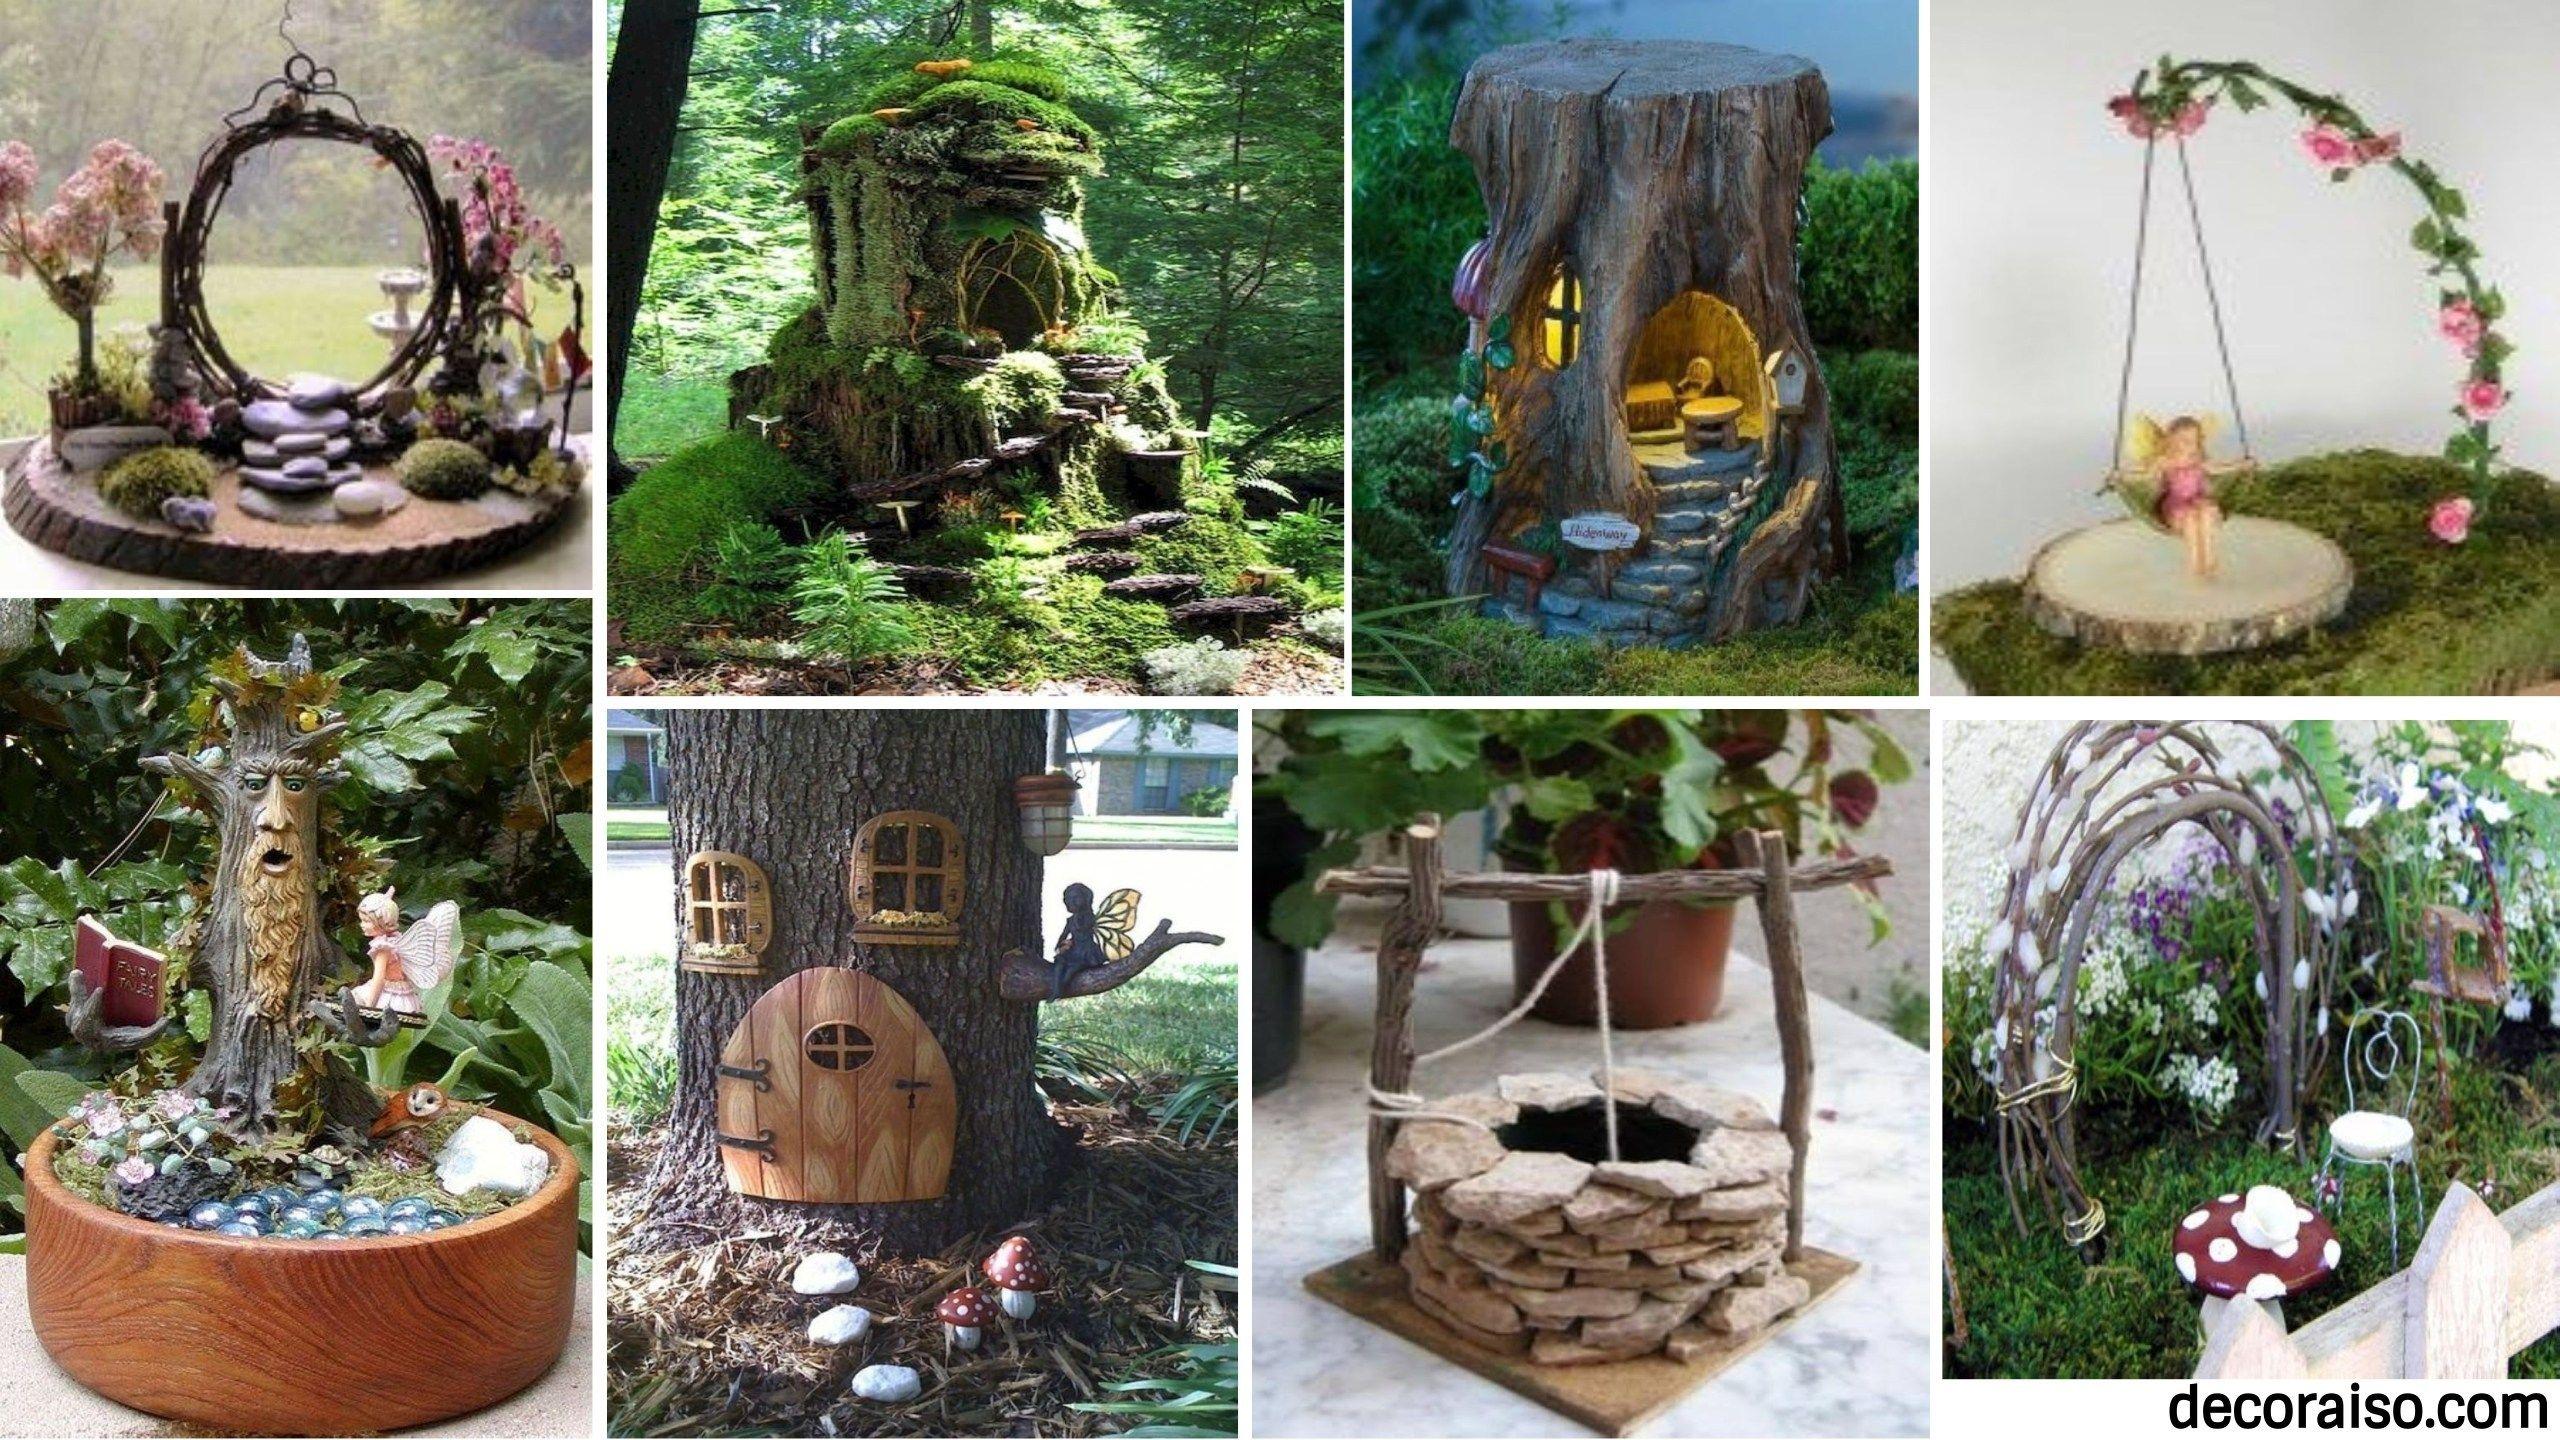 There Are Numerous Fairy Garden Ideas